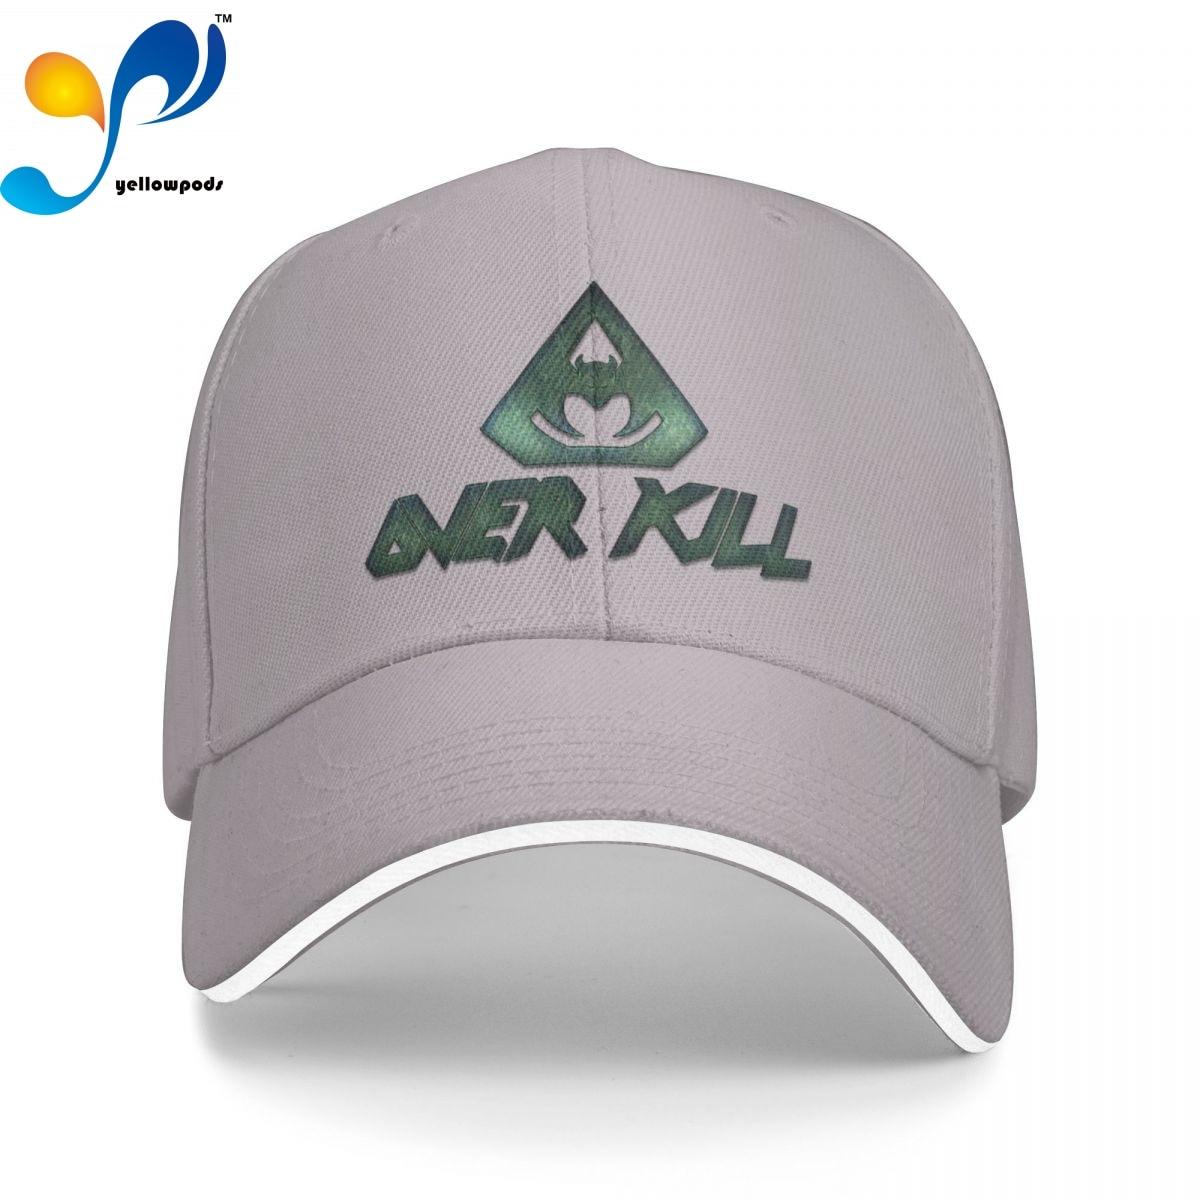 Бейсболка, мужские модные кепки Overkill, шапки для логотипа, мужская шапка для отца, кепка для мужчин, Кепка-тракер